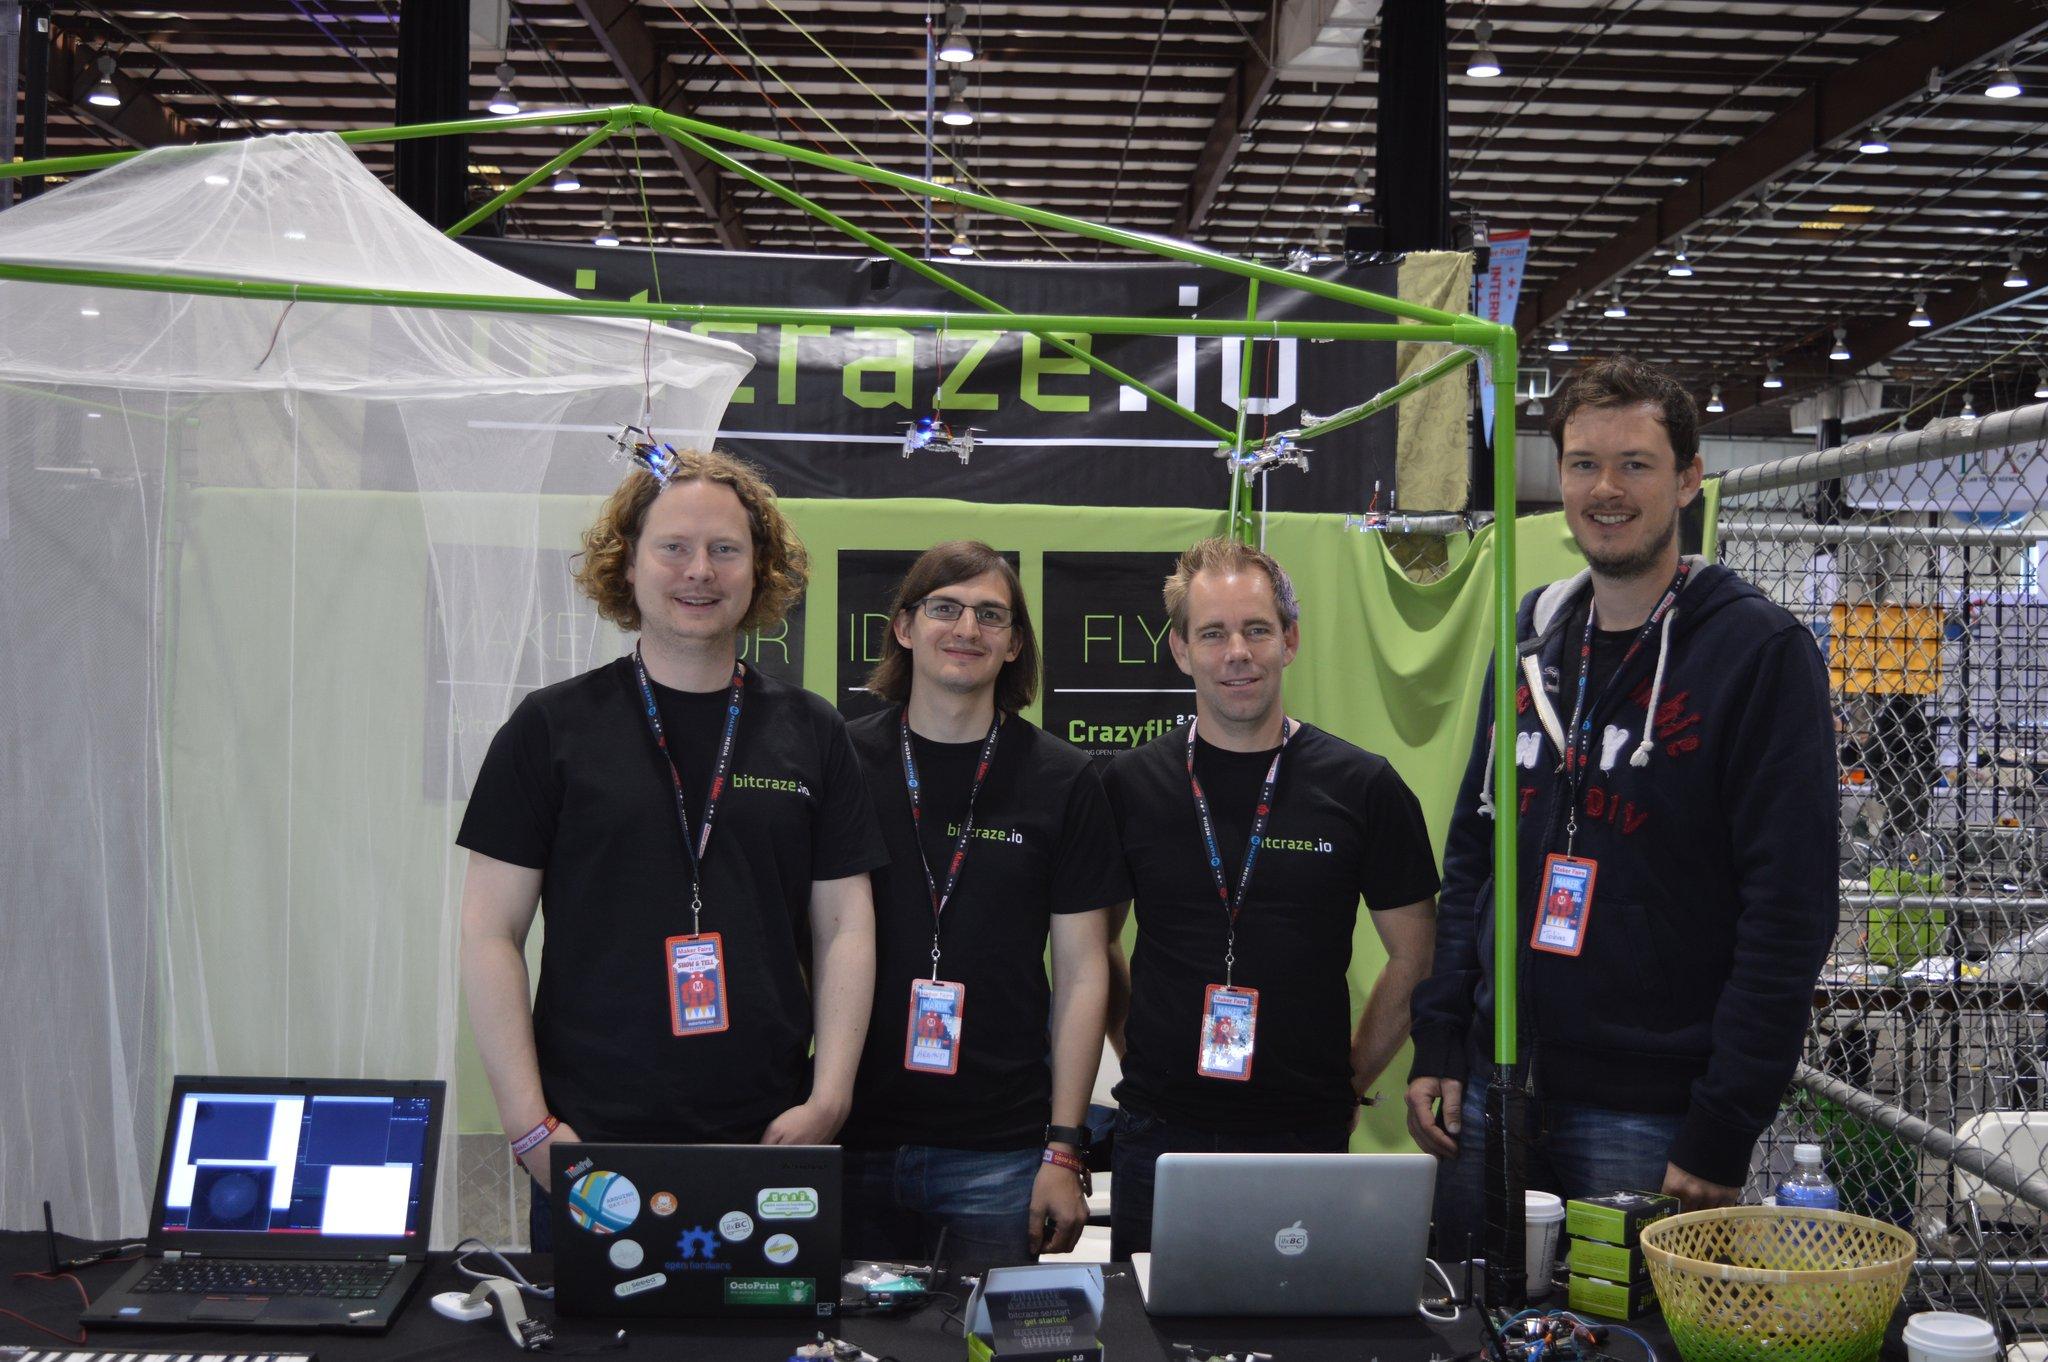 MF15 - Team Bitcraze